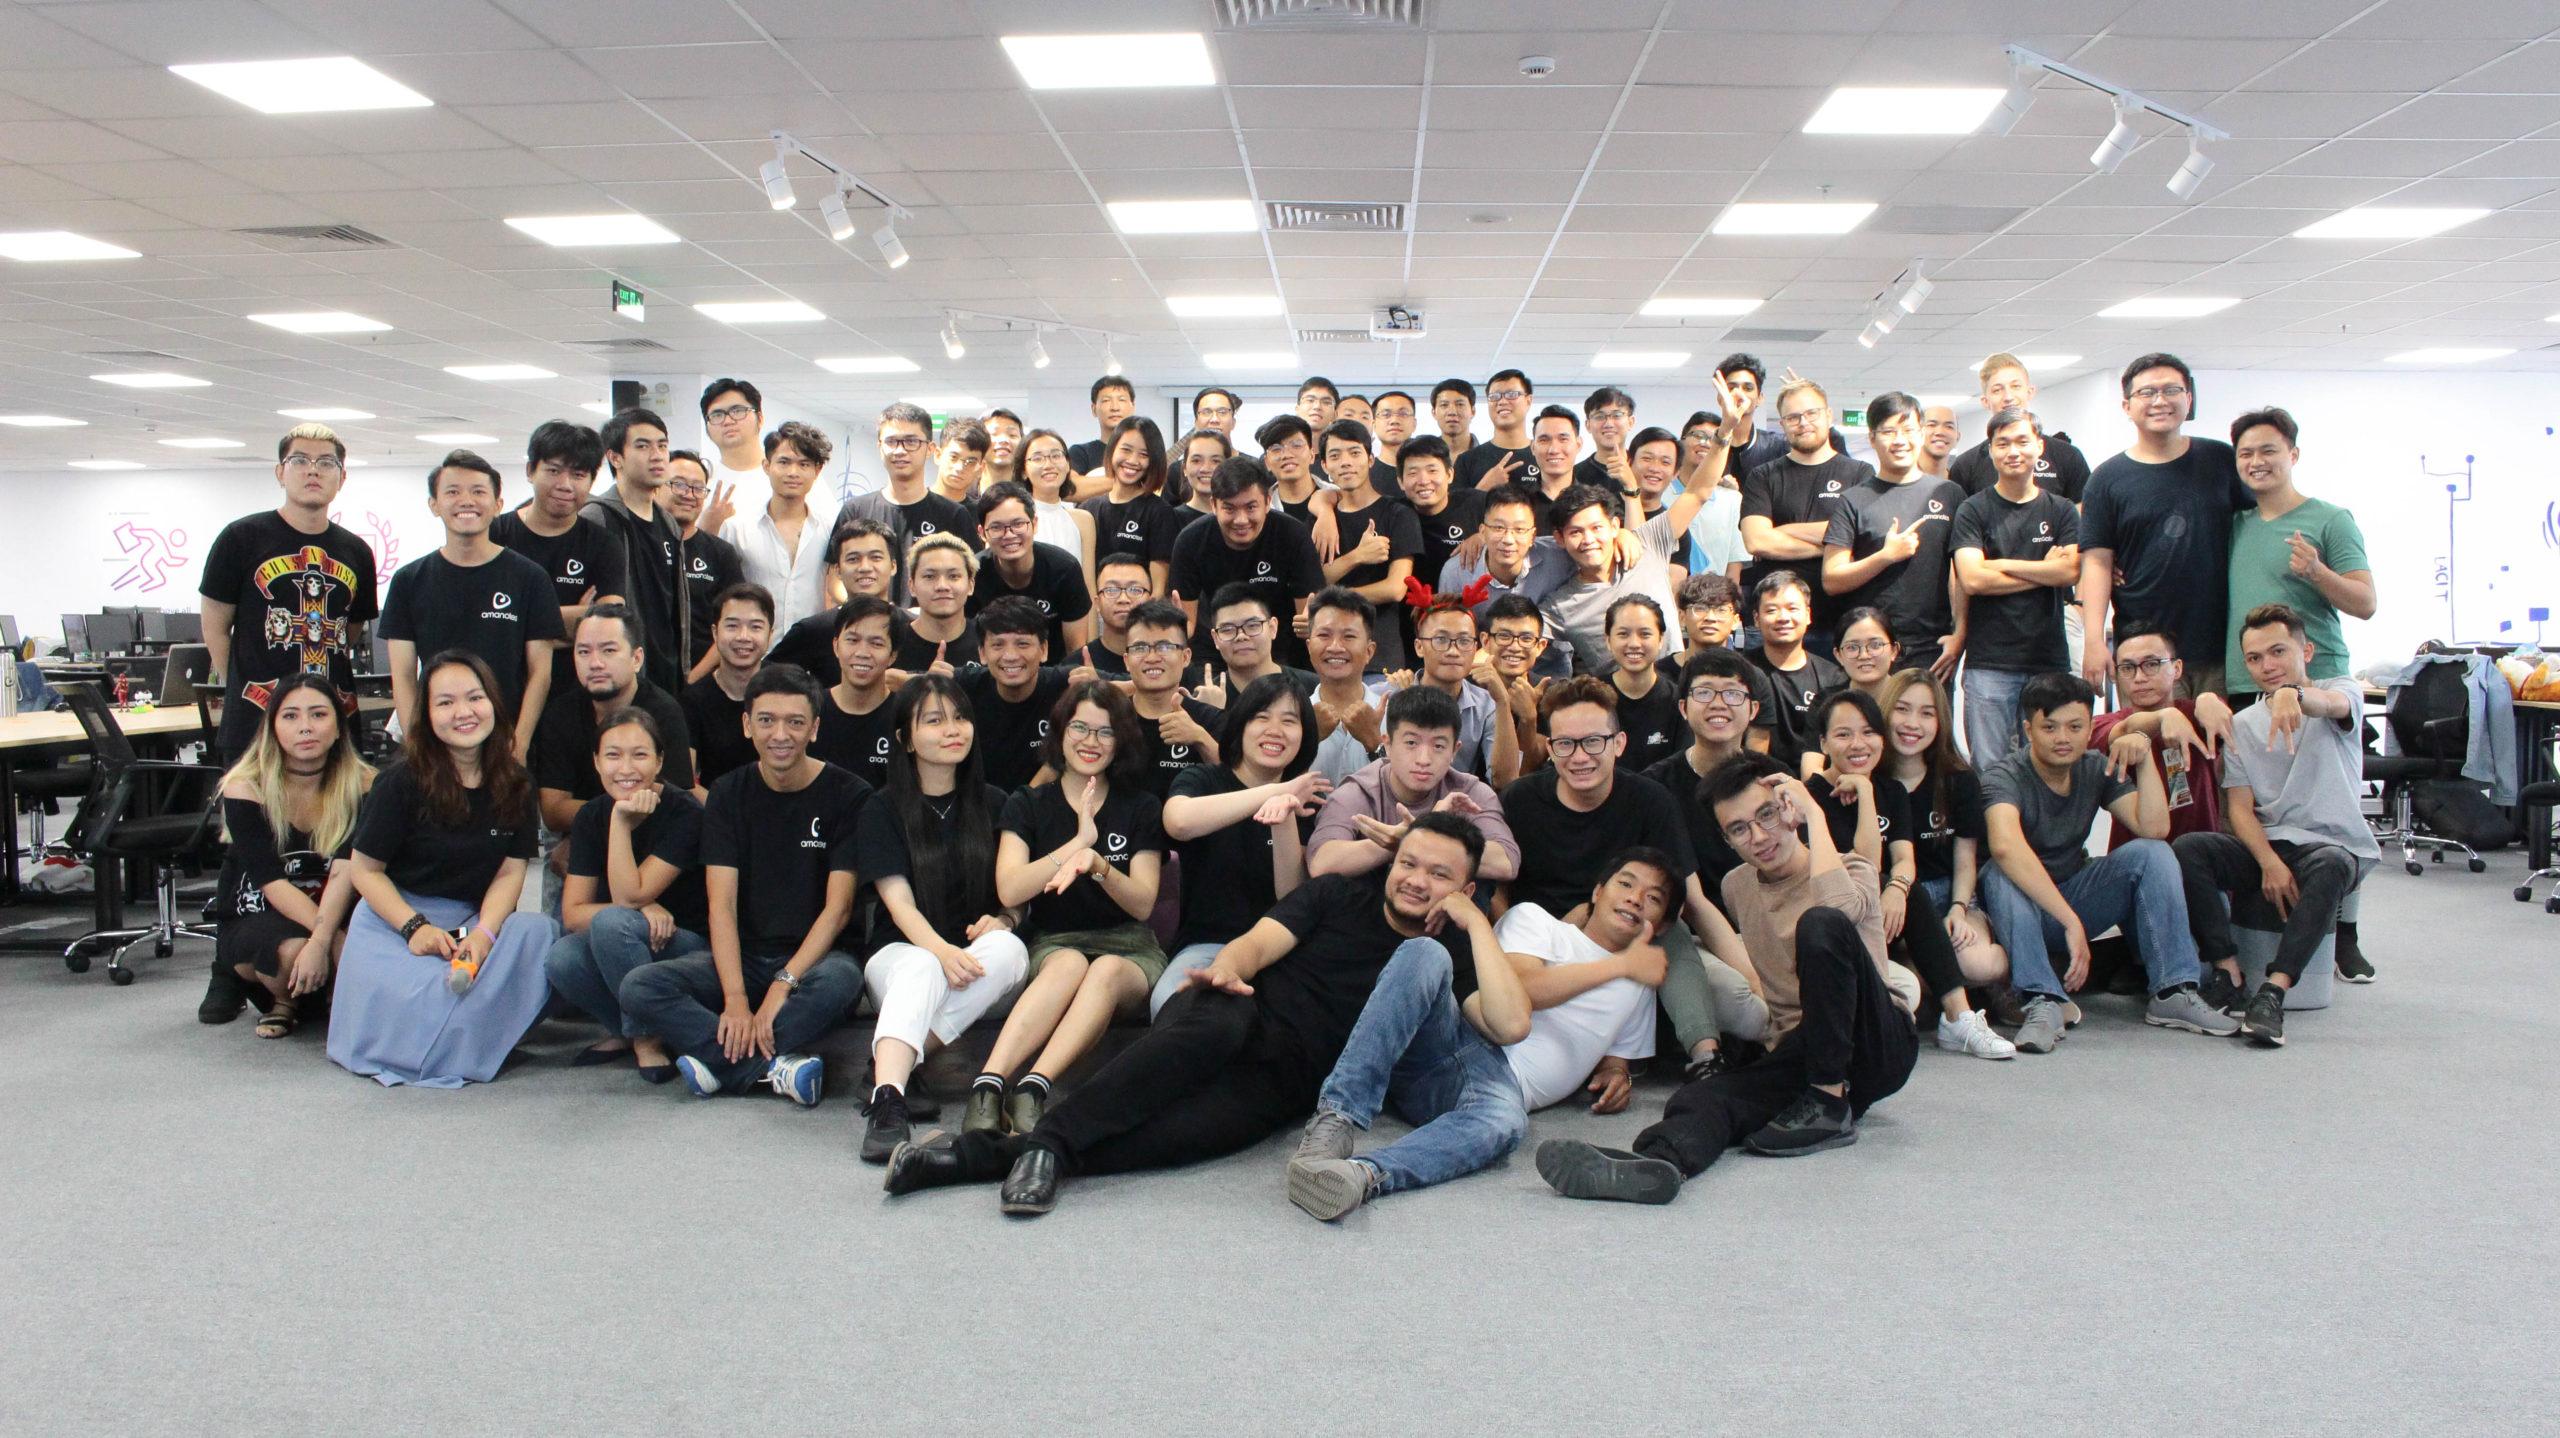 Amanotes team picture